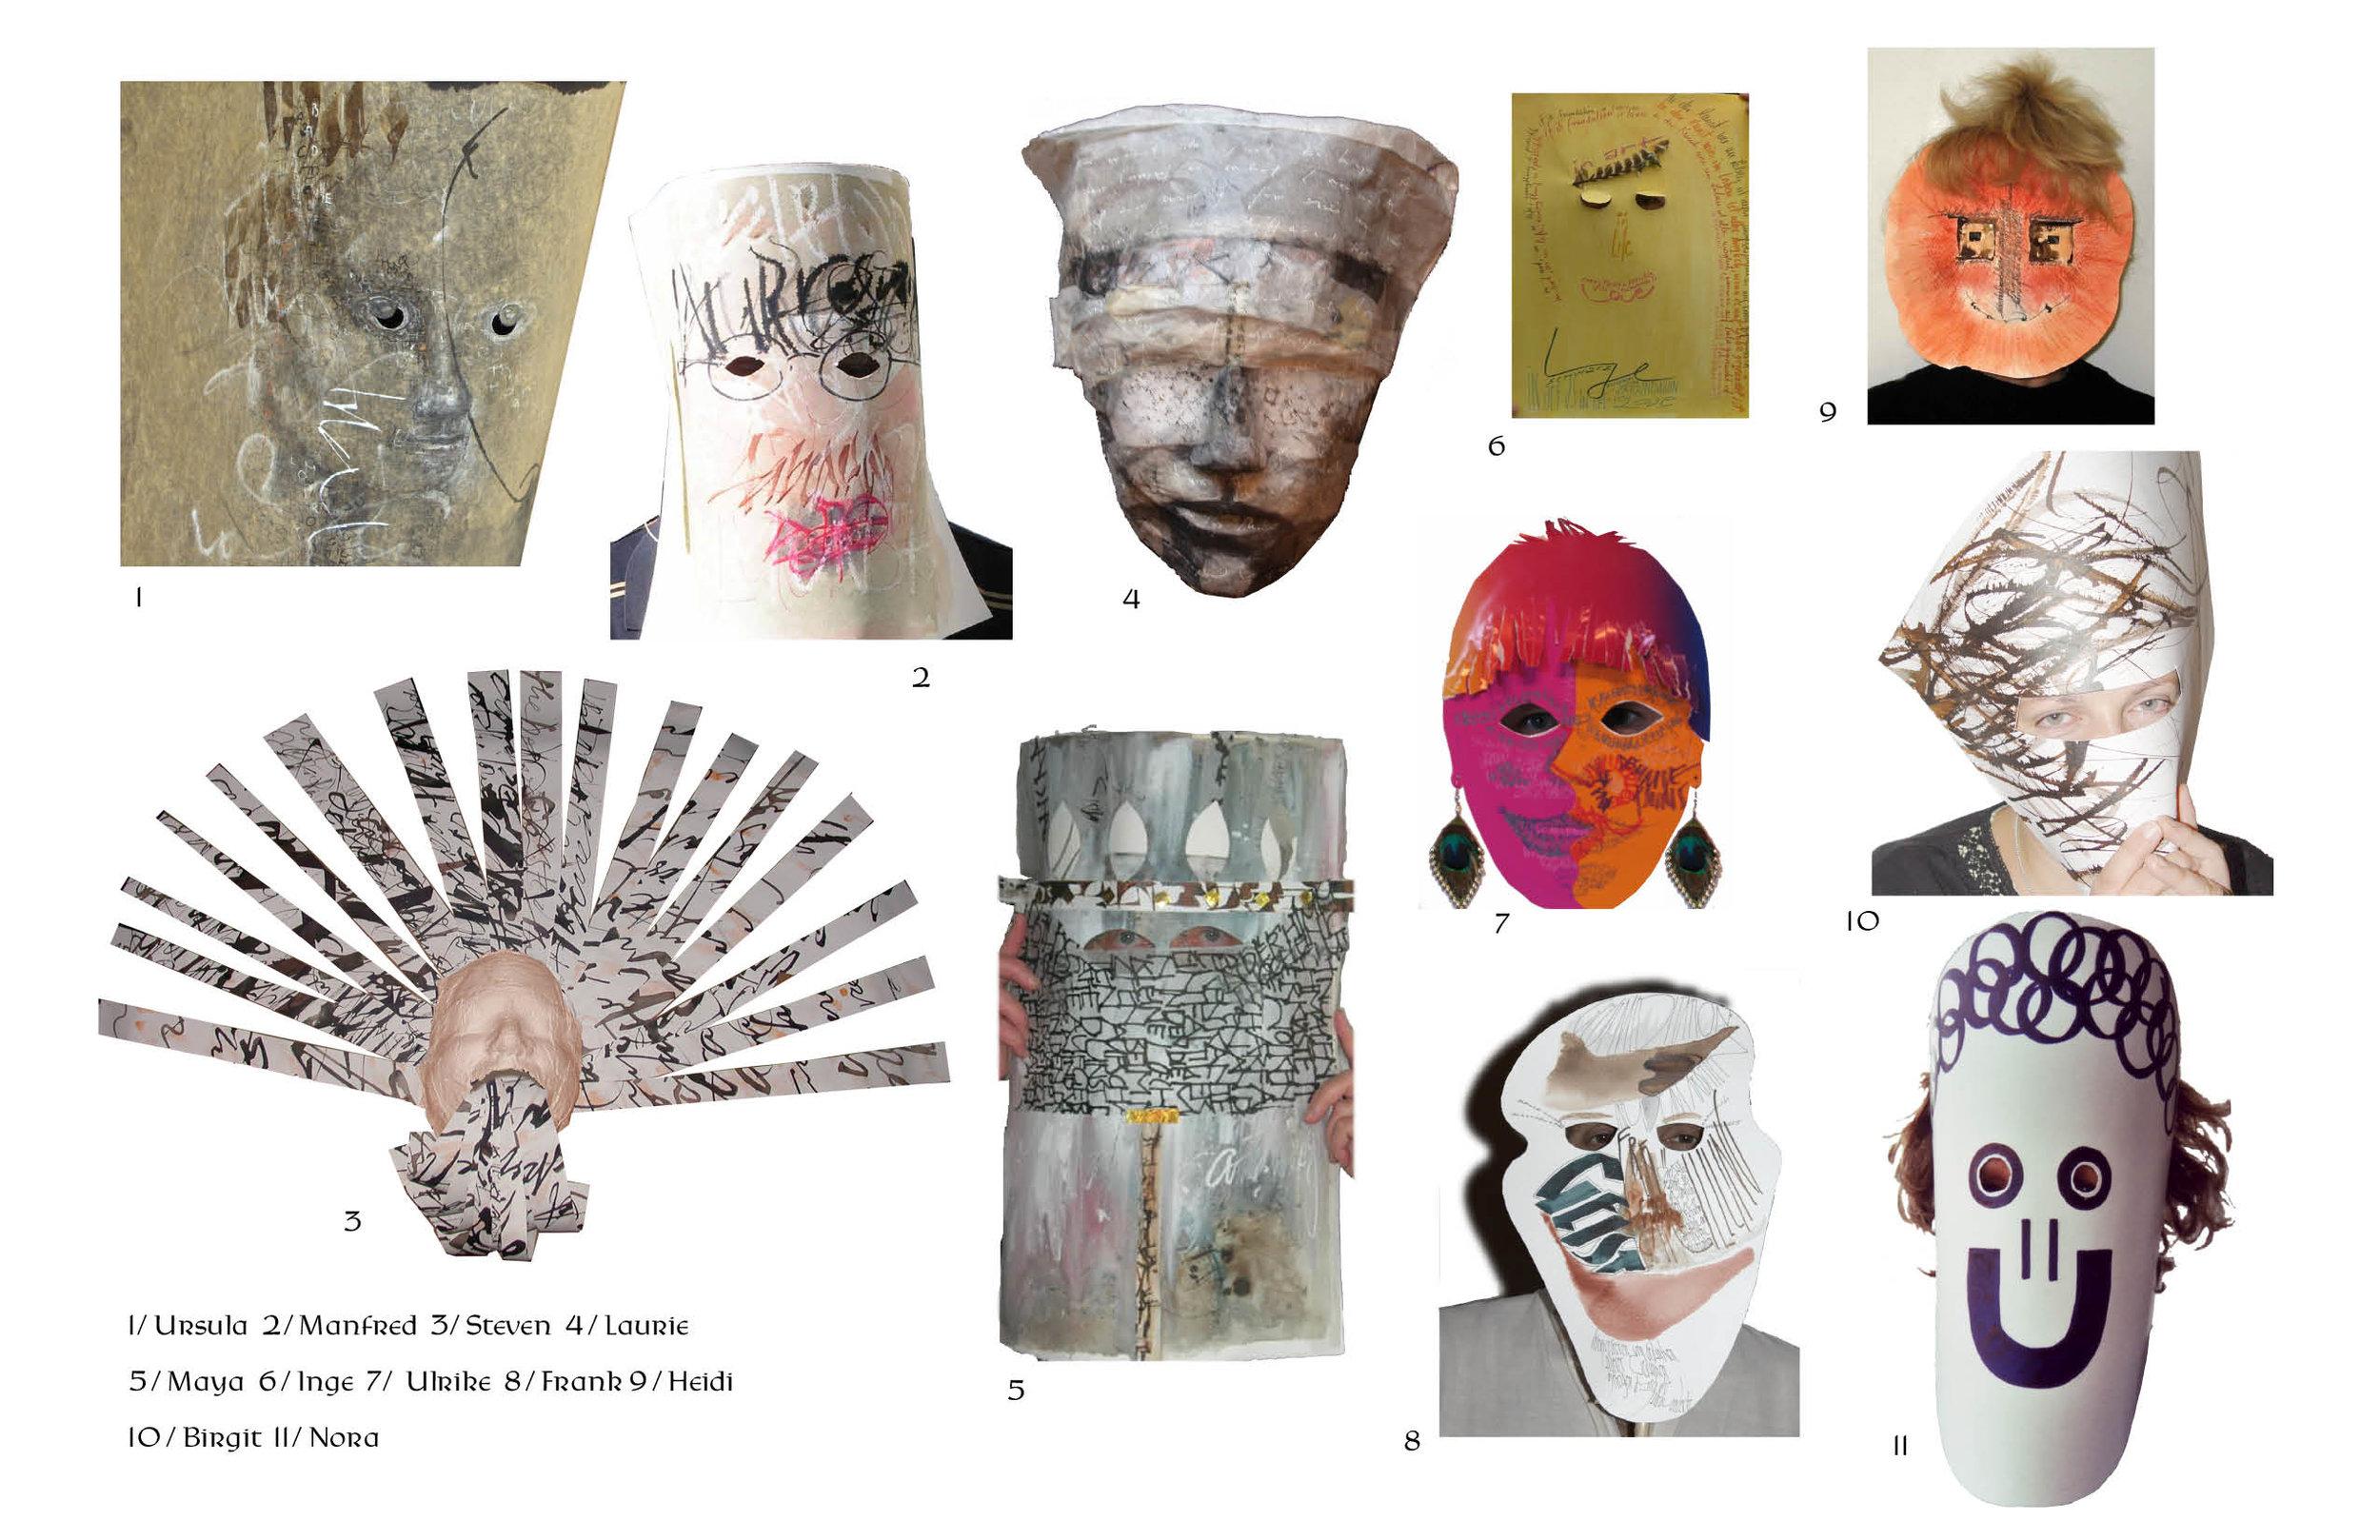 Masks from our class in Germany : Ursula Sutter, Manfred Blum, Steven Skaggs, Laurie Doctor, Maya Huber, Inge Schwartz, Frank Fath, Heidi Loosen, Birgit Nass and Nora Clormann